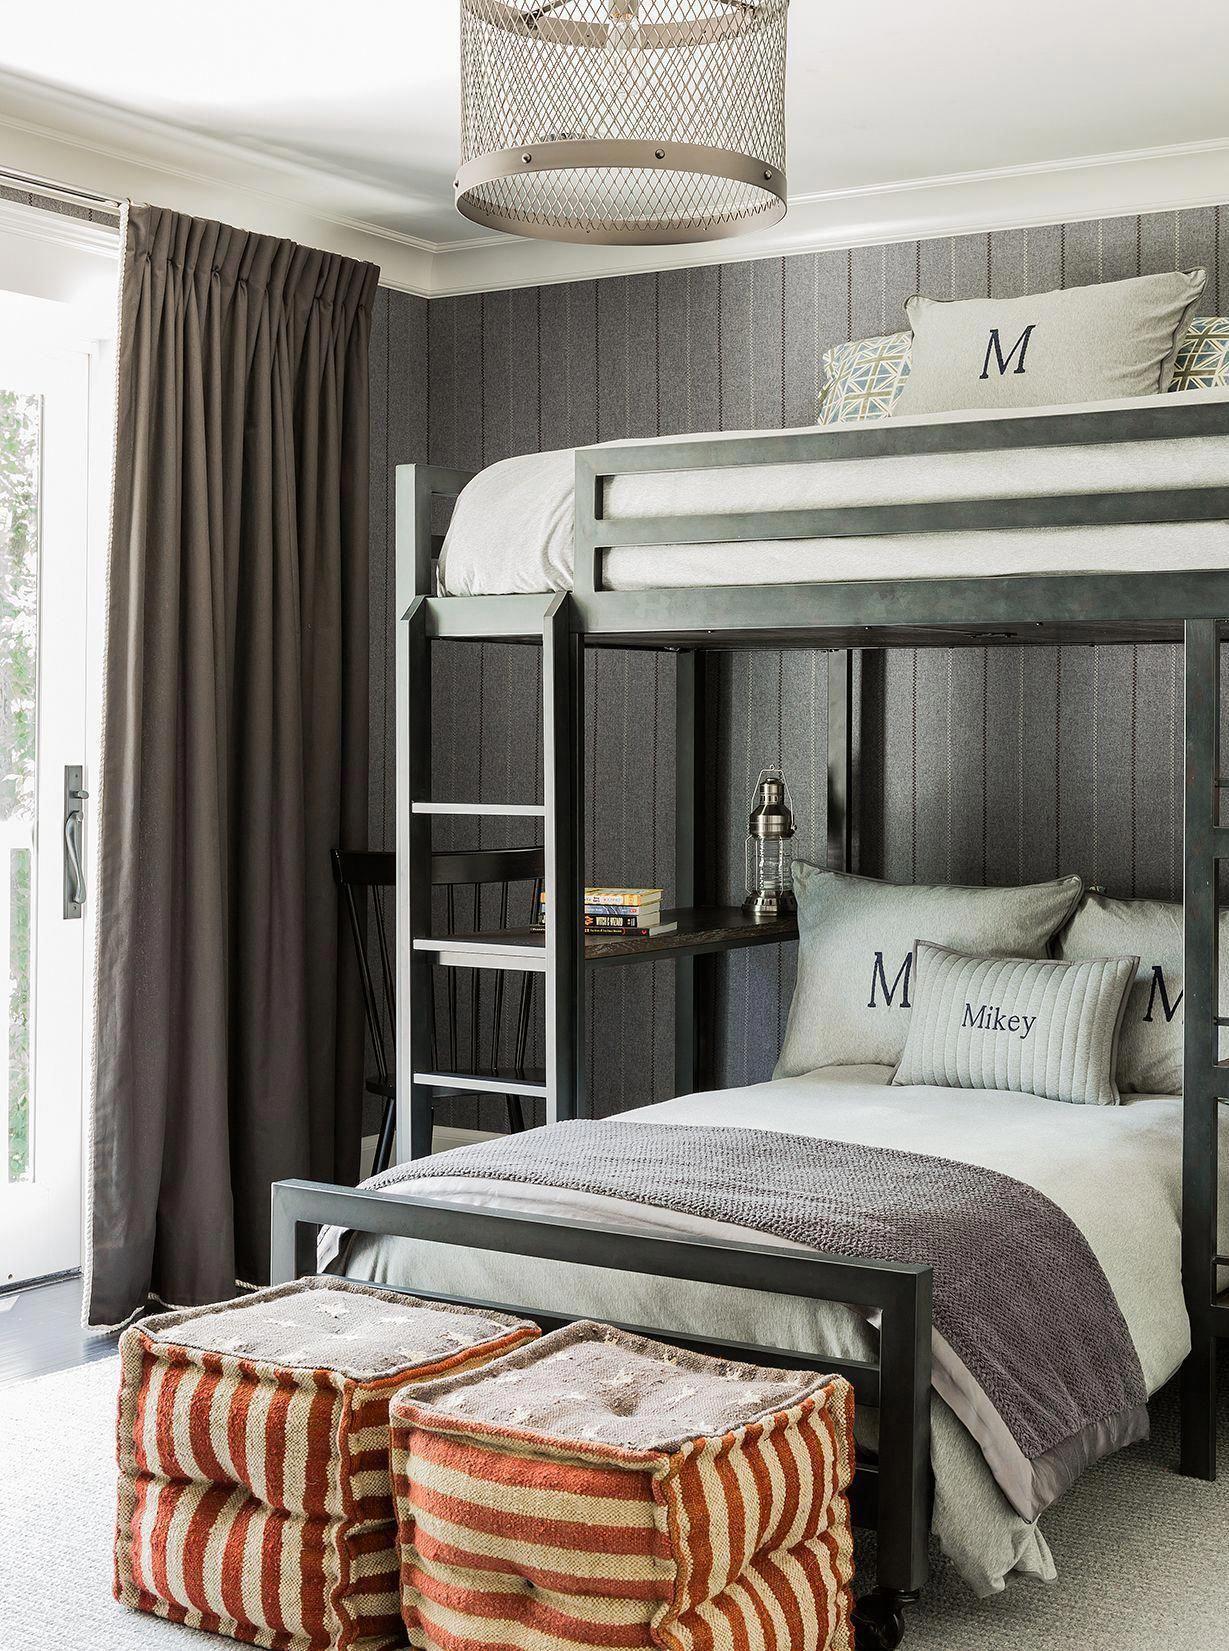 5 Wonderful Ideas Of Triple Bunk Beds For Your Kids Bedroom Interior Design Bunk Bed Designs Bunk Beds Boys Kids Bunk Beds